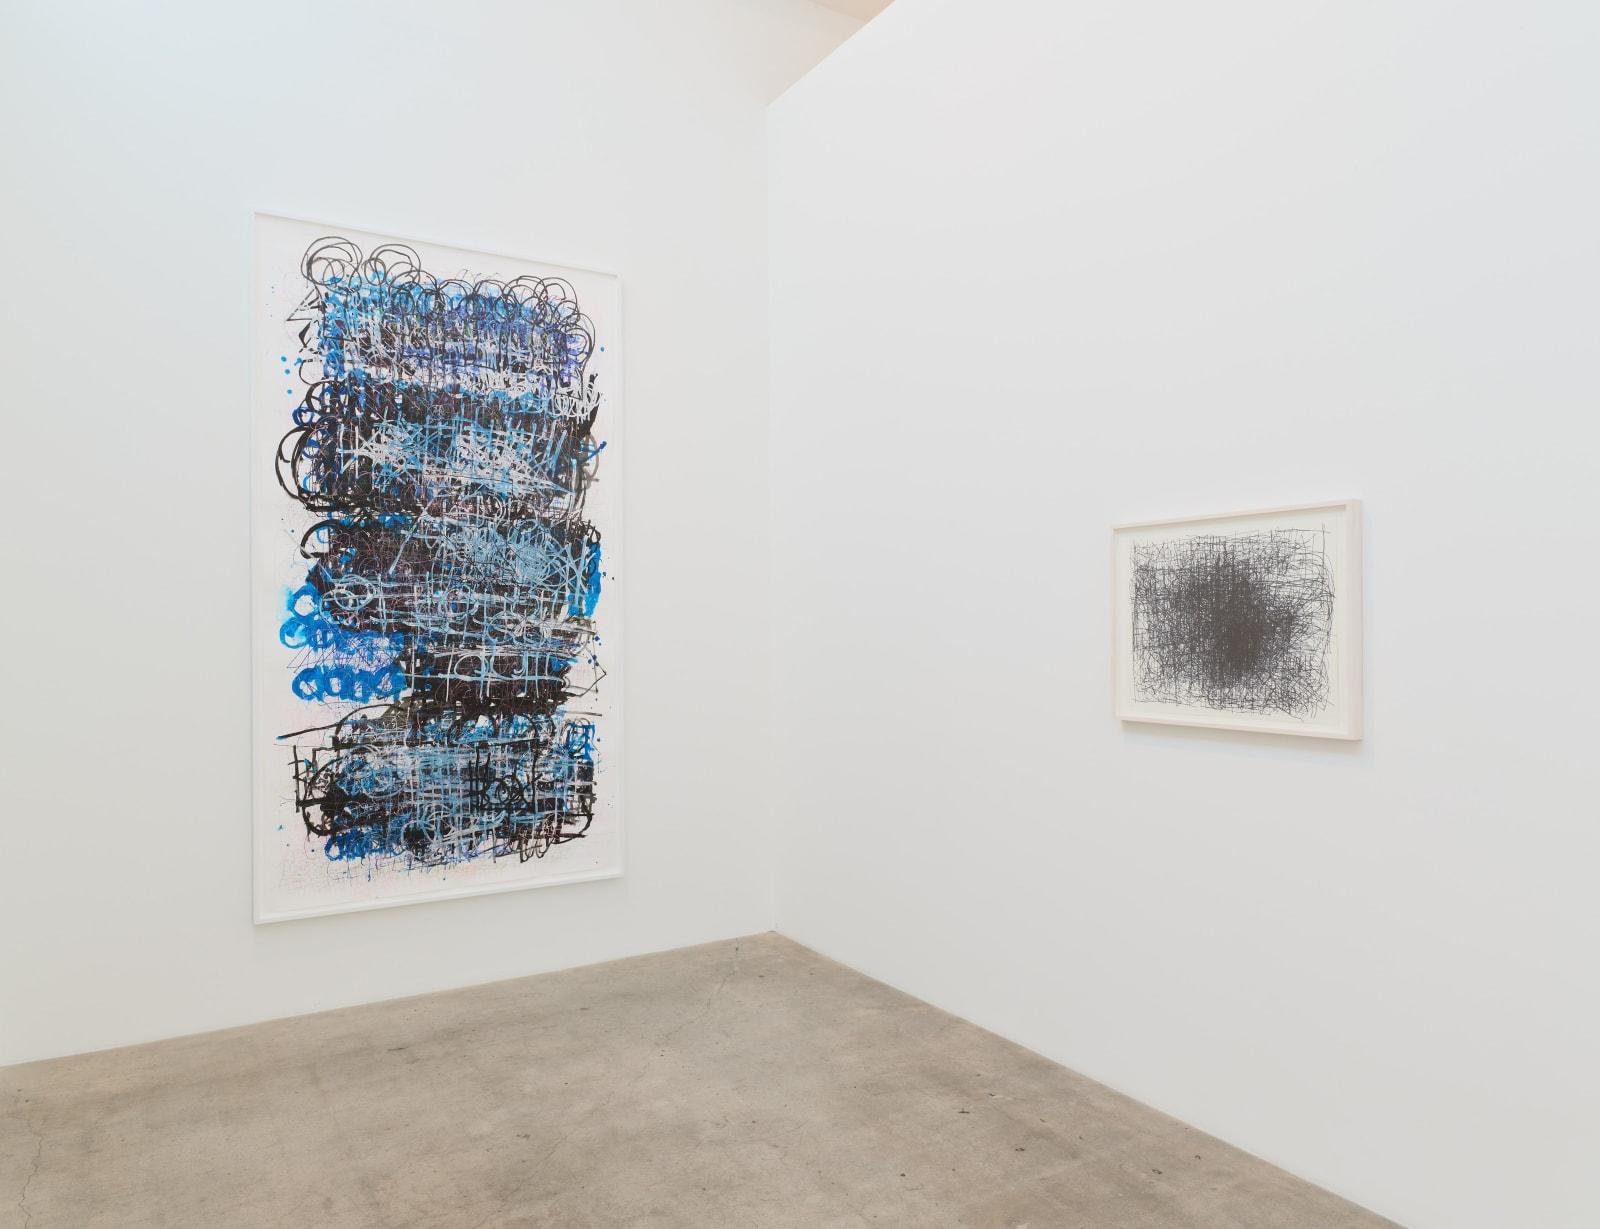 Dan Miller: Important Paintings and Textiles